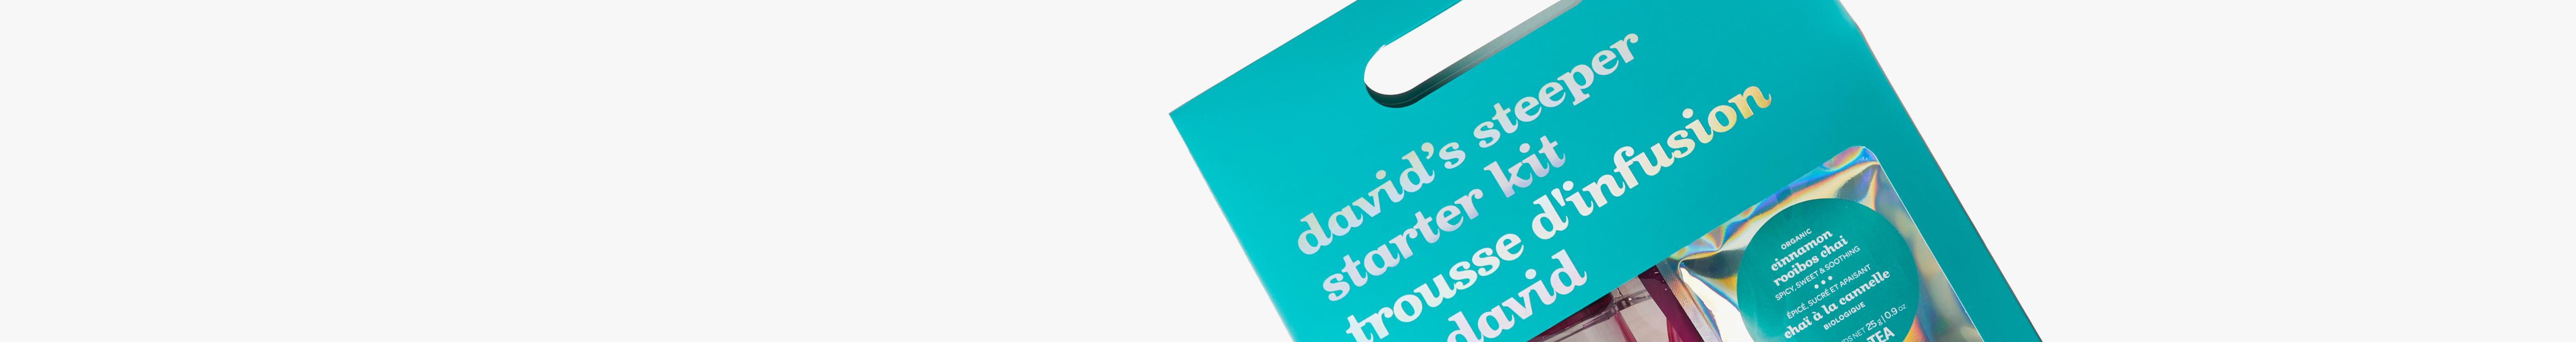 David's Stepper Starter Kit on a white backdrop.